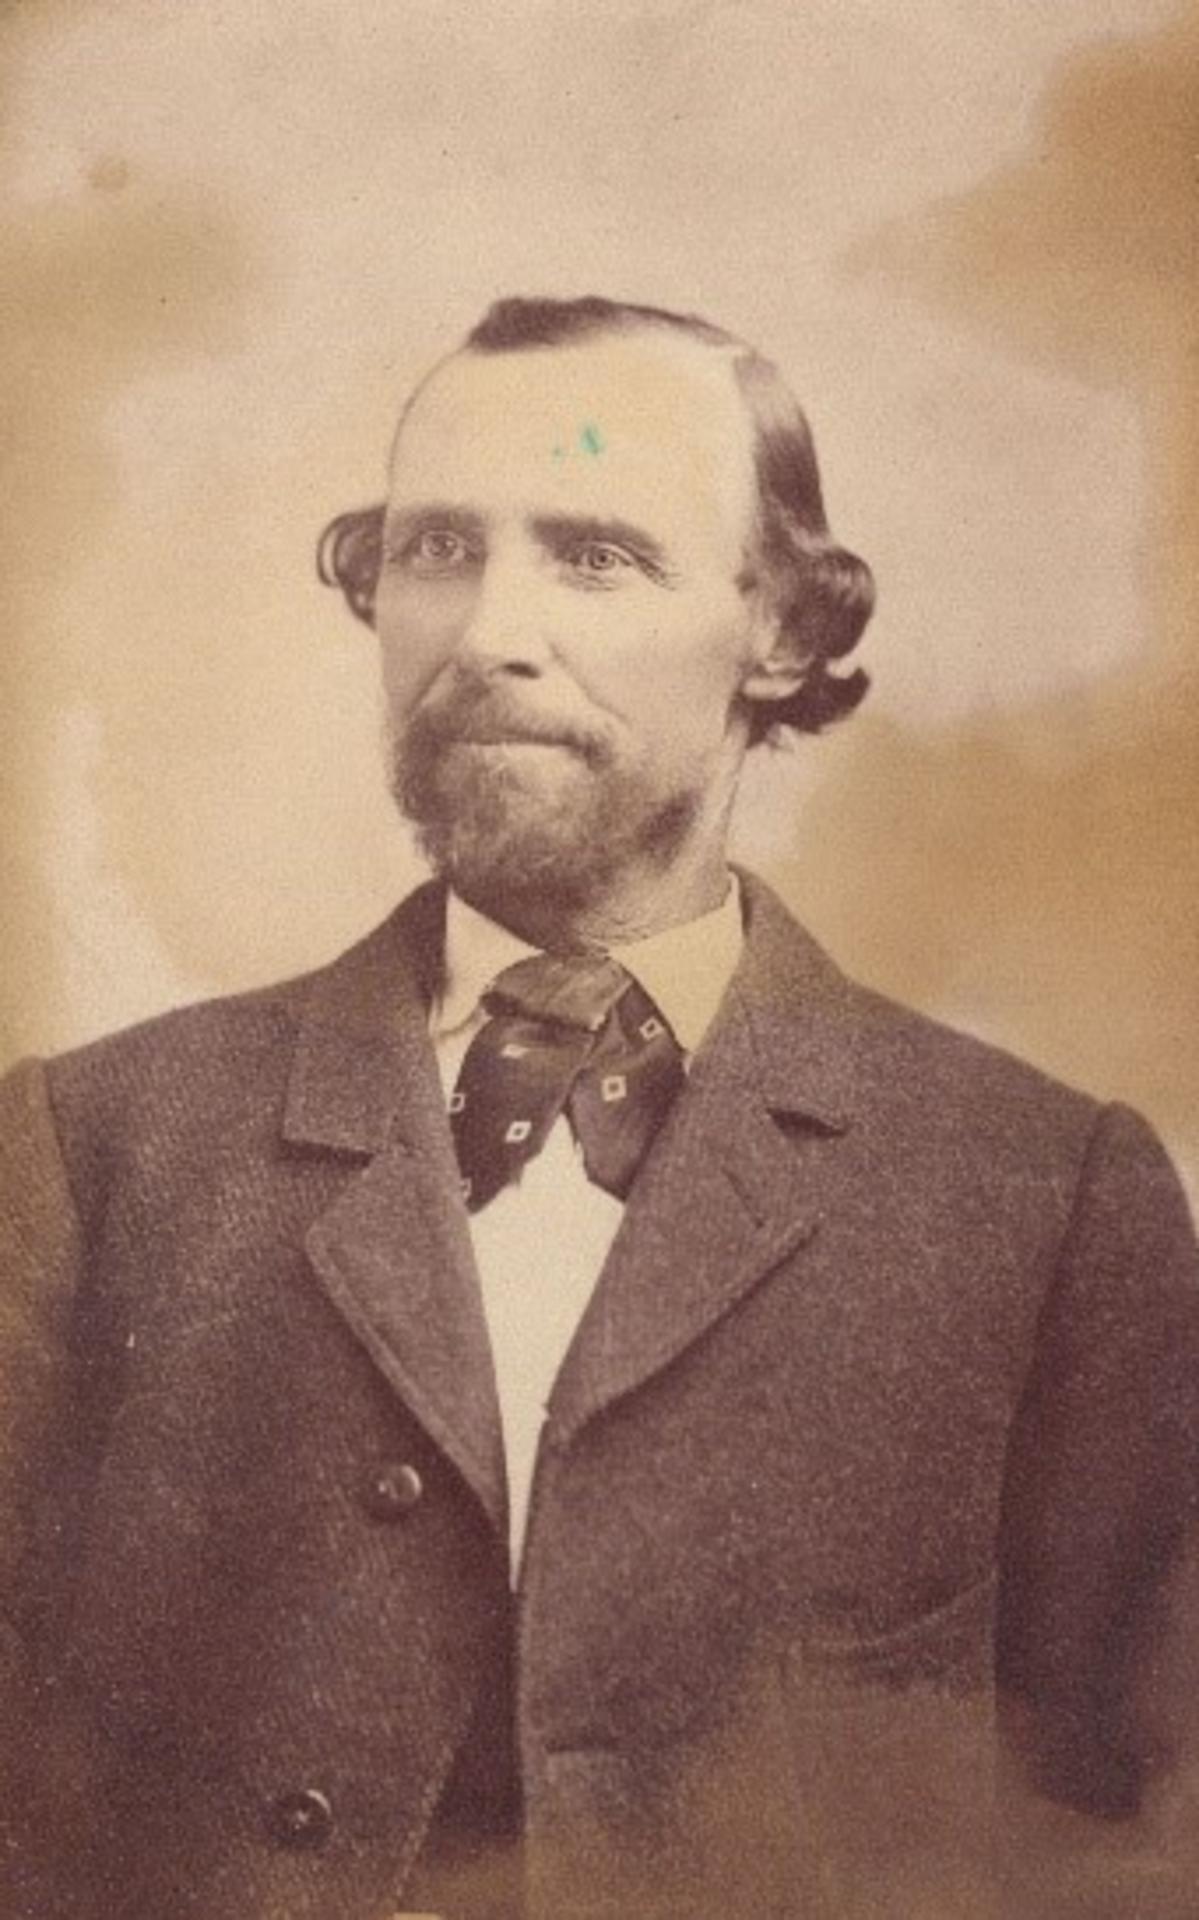 Thomas Obray